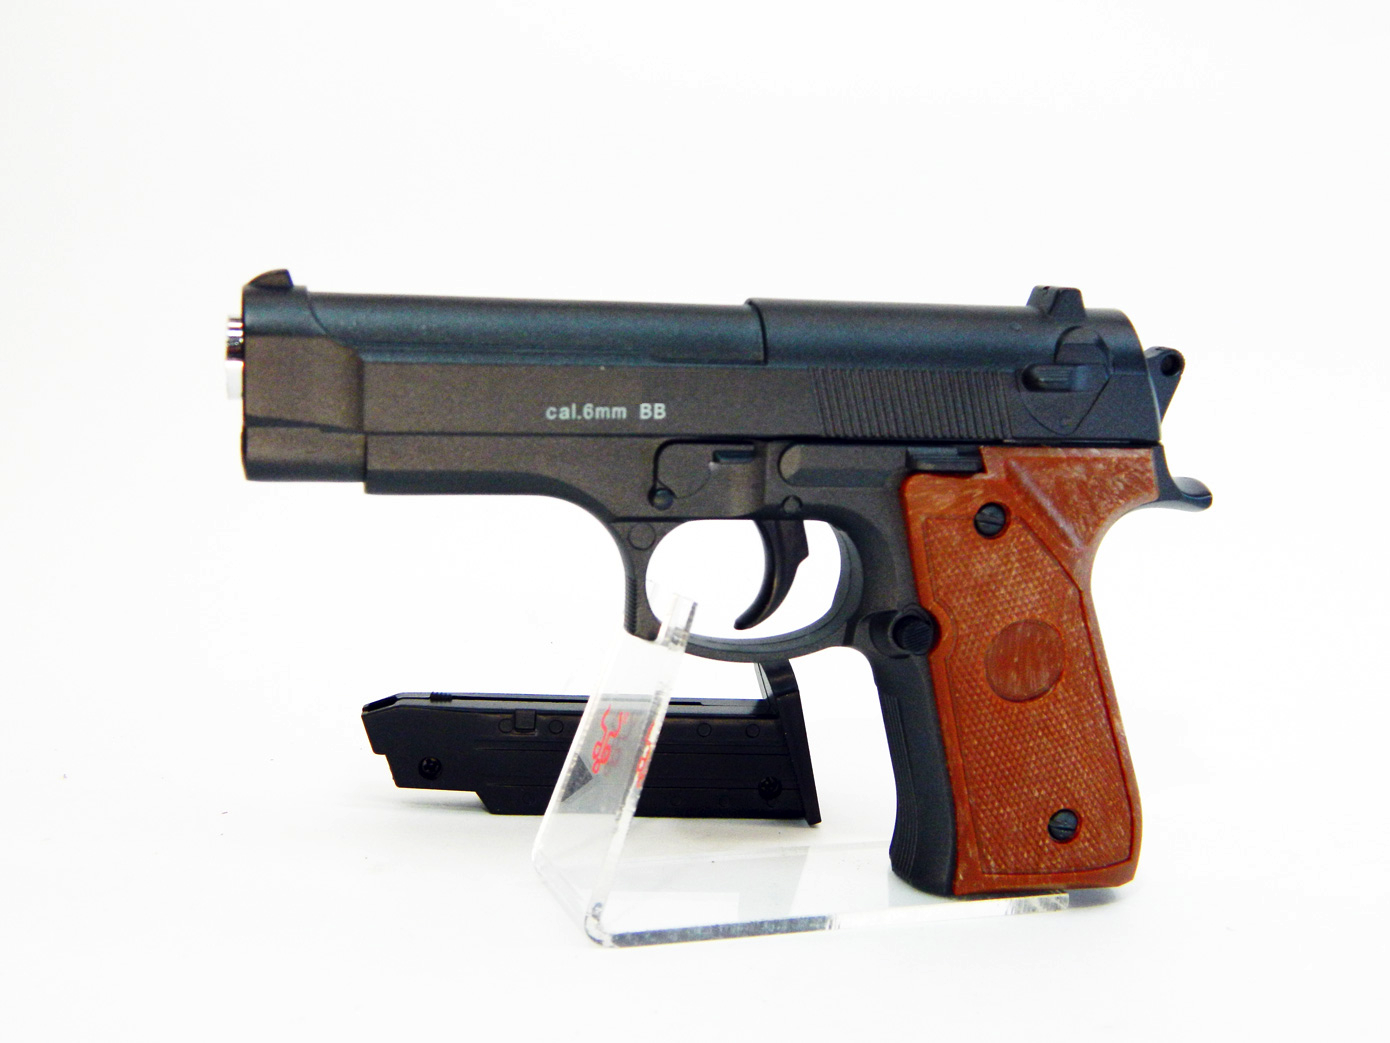 Beretta 92 mini масштаб 1:1 изображение 2